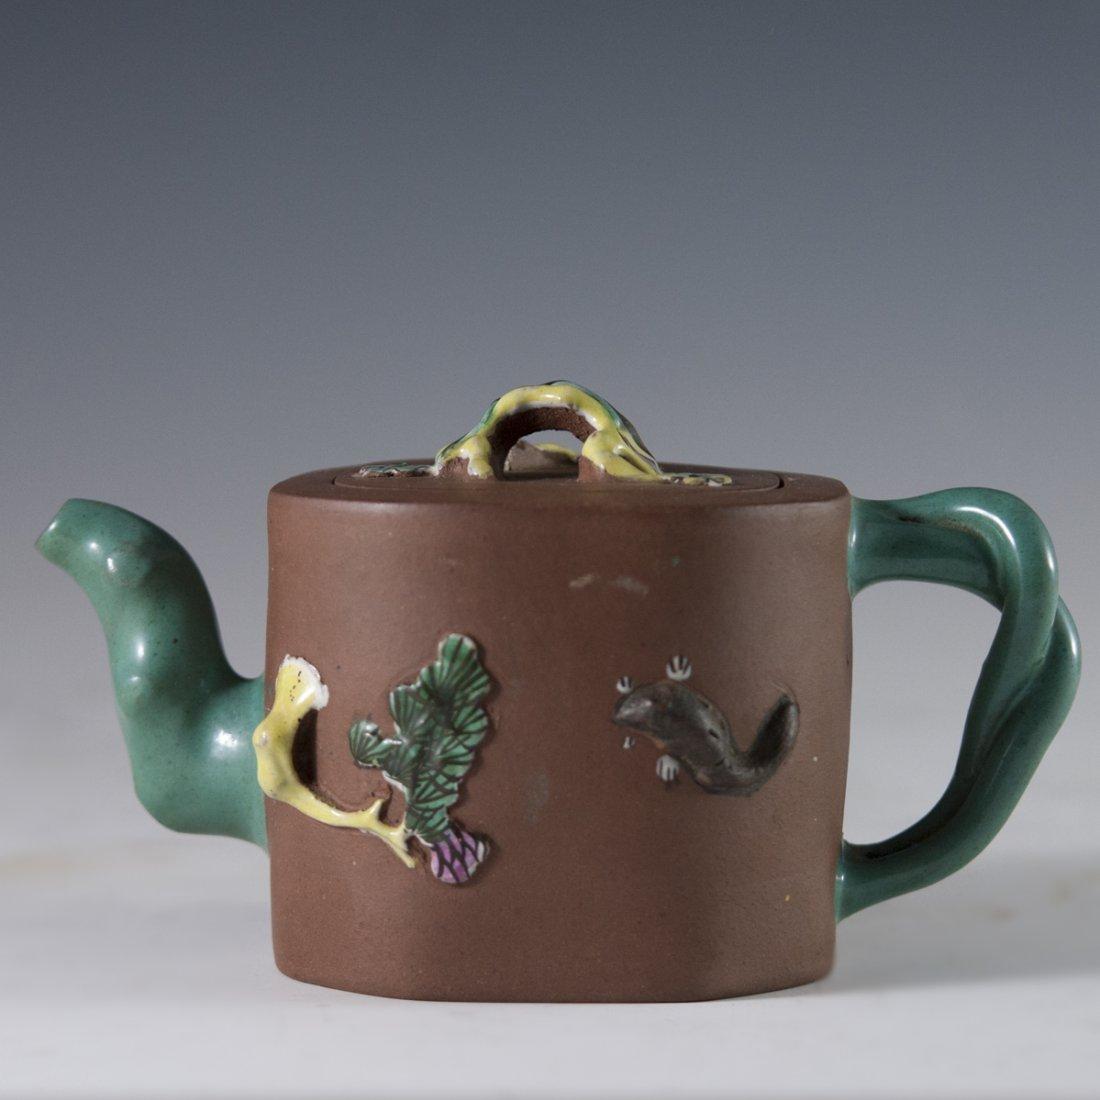 Enameled Chinese Terracotta Teapot